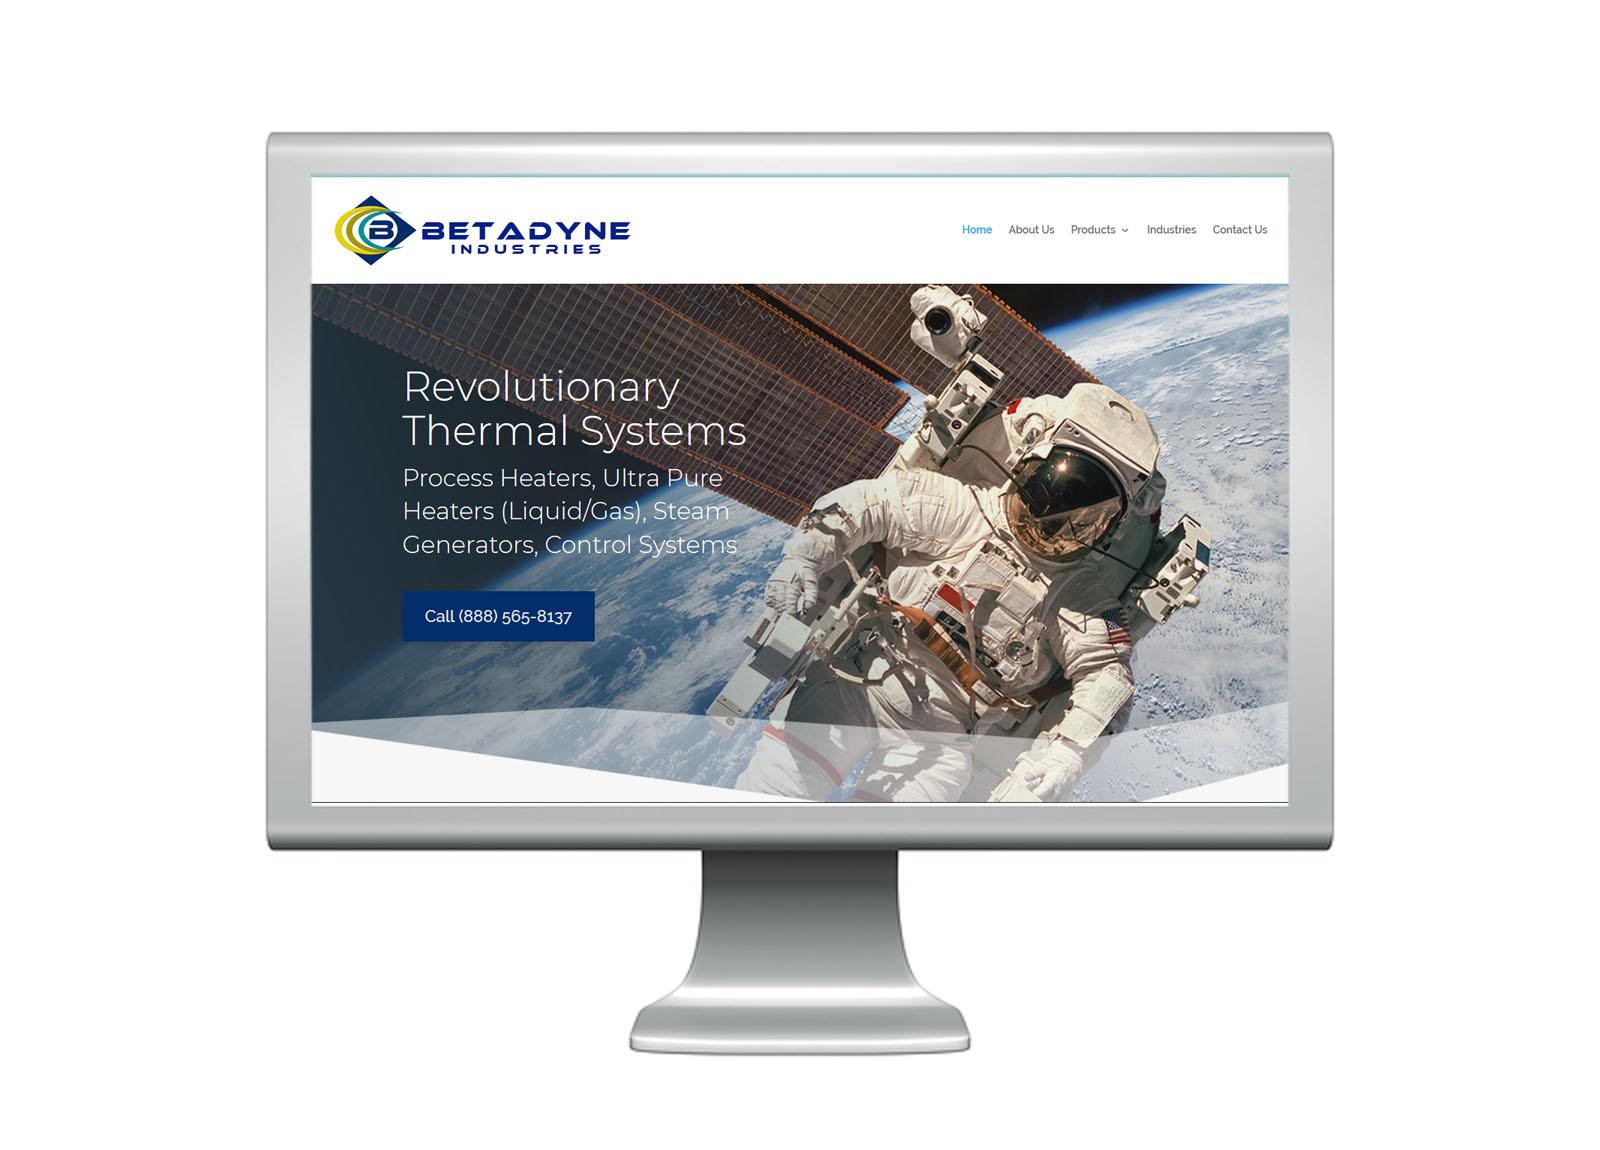 Betadyne Industries